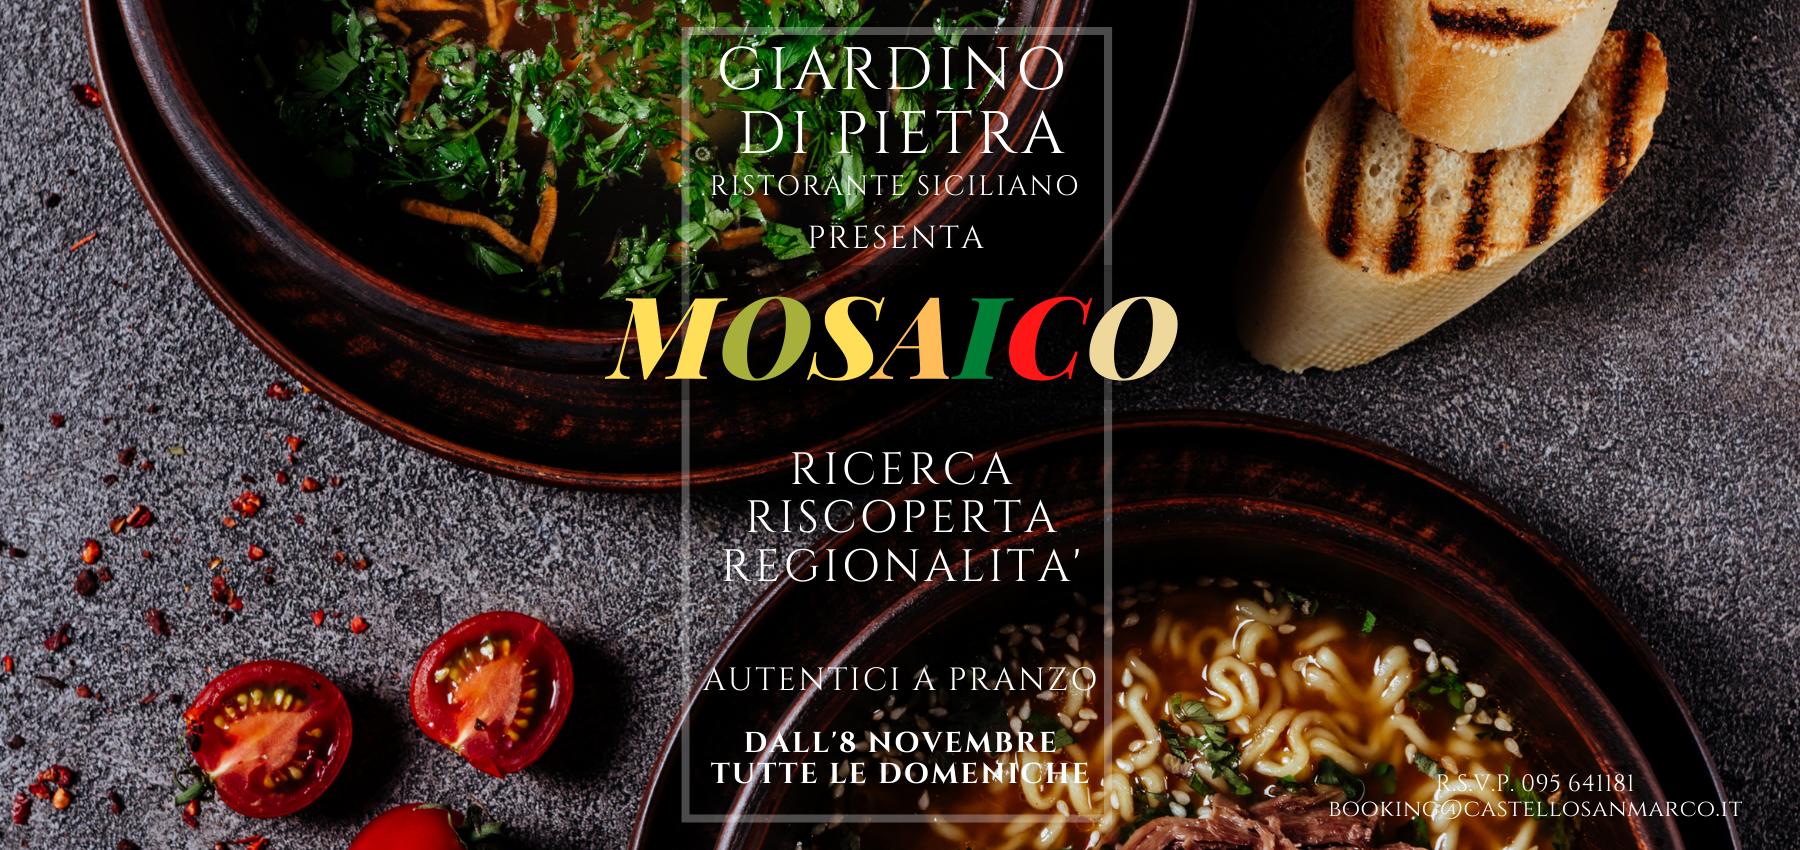 mosaico-1800x850